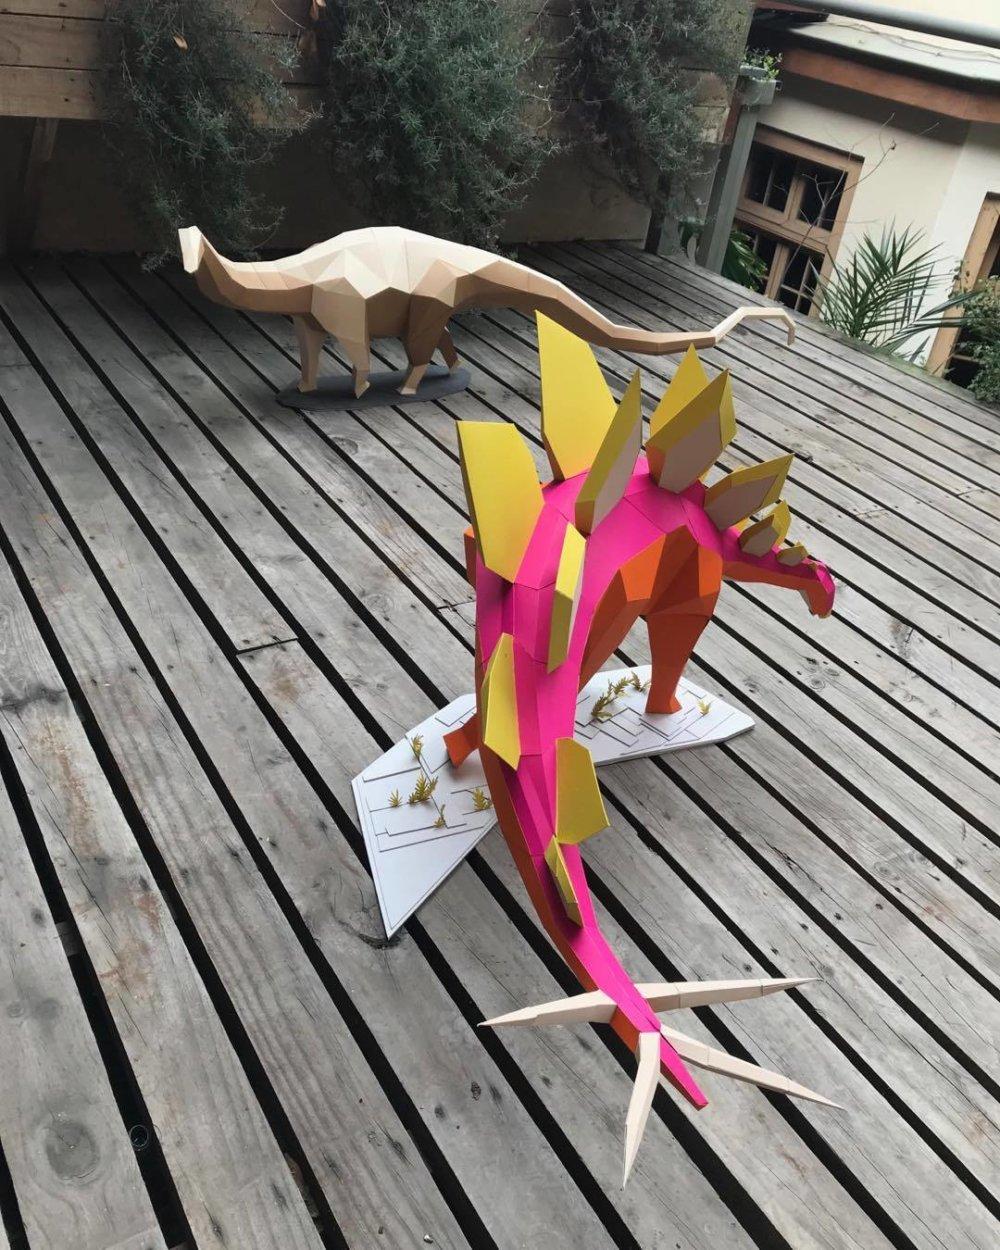 Khartosauria Colorful And Accurate 3d Dinosaur Paper Sculptures By Seba Naranjo 7